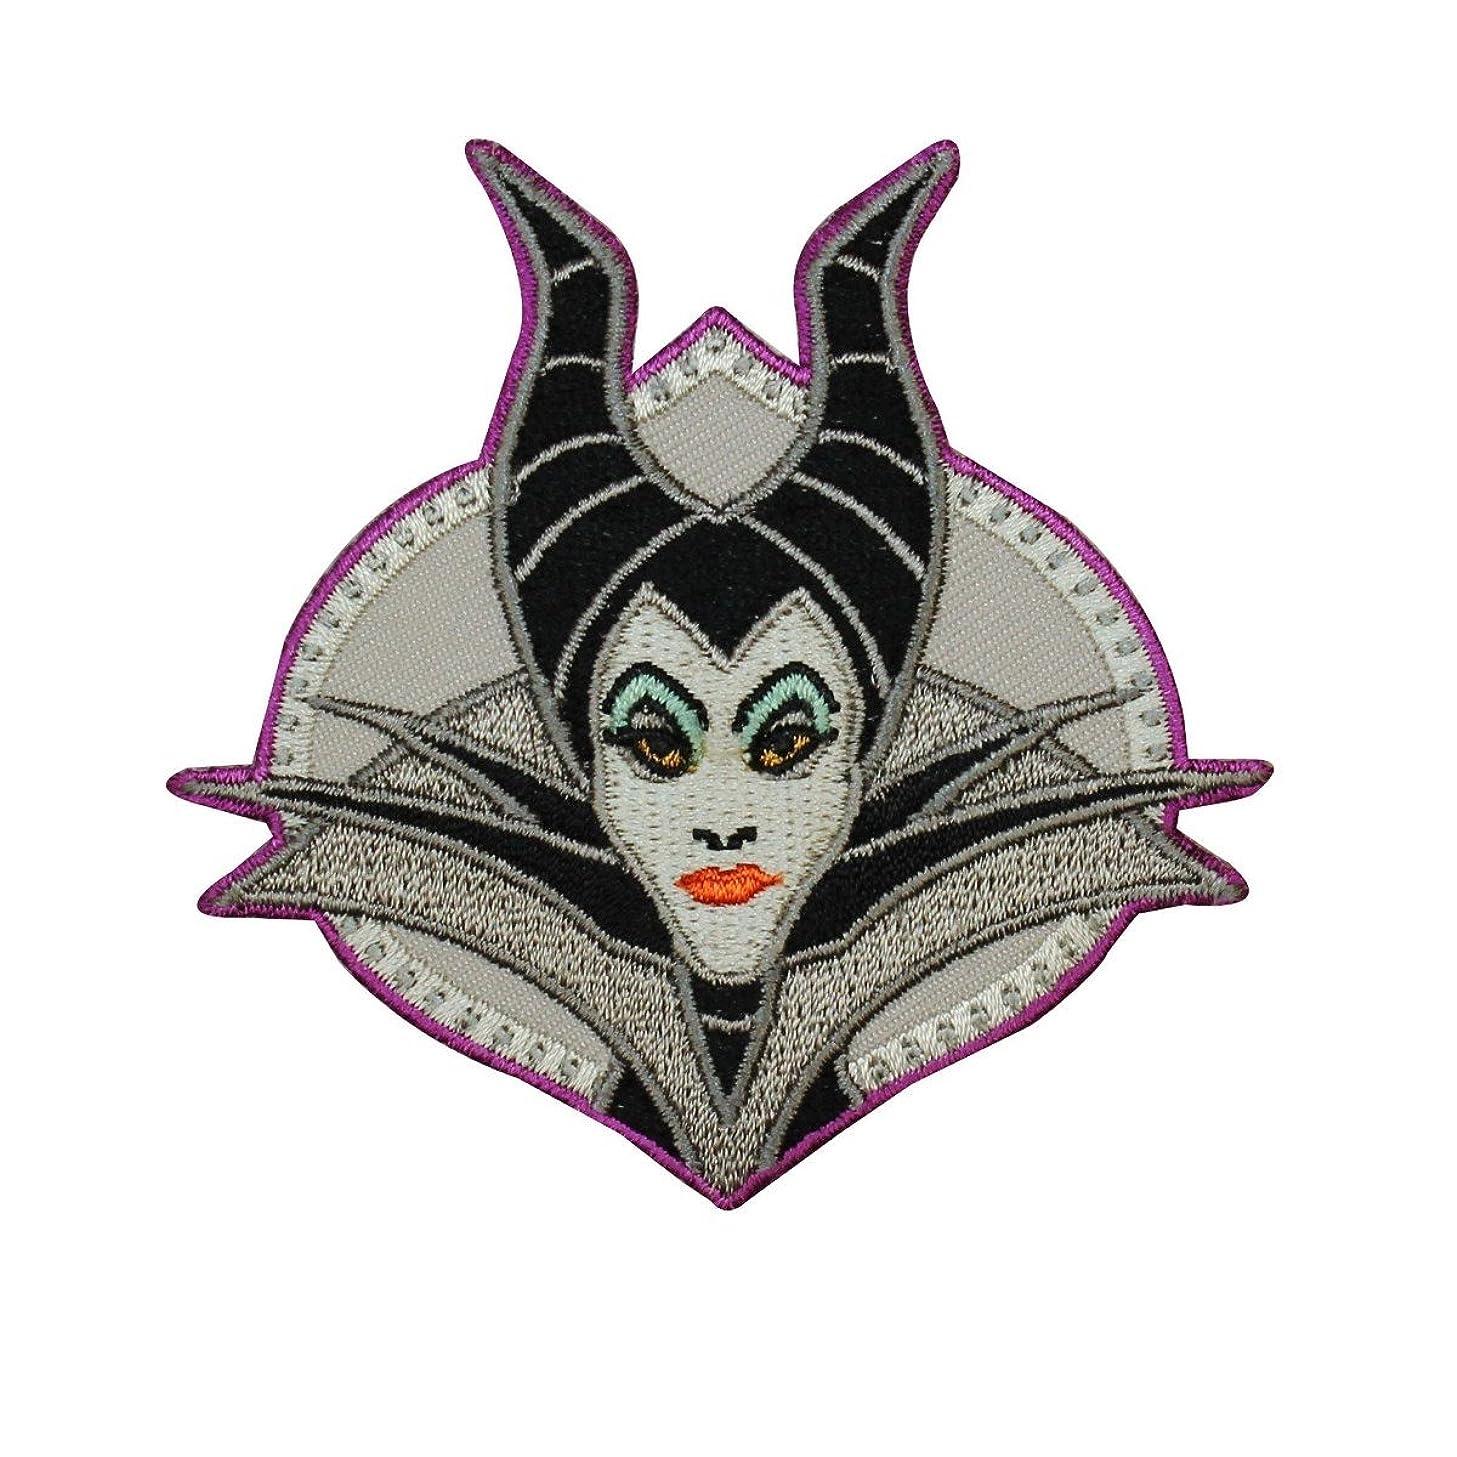 Maleficent Portrait Sleeping Beauty Iron On Patch Disney Movie Apparel Applique